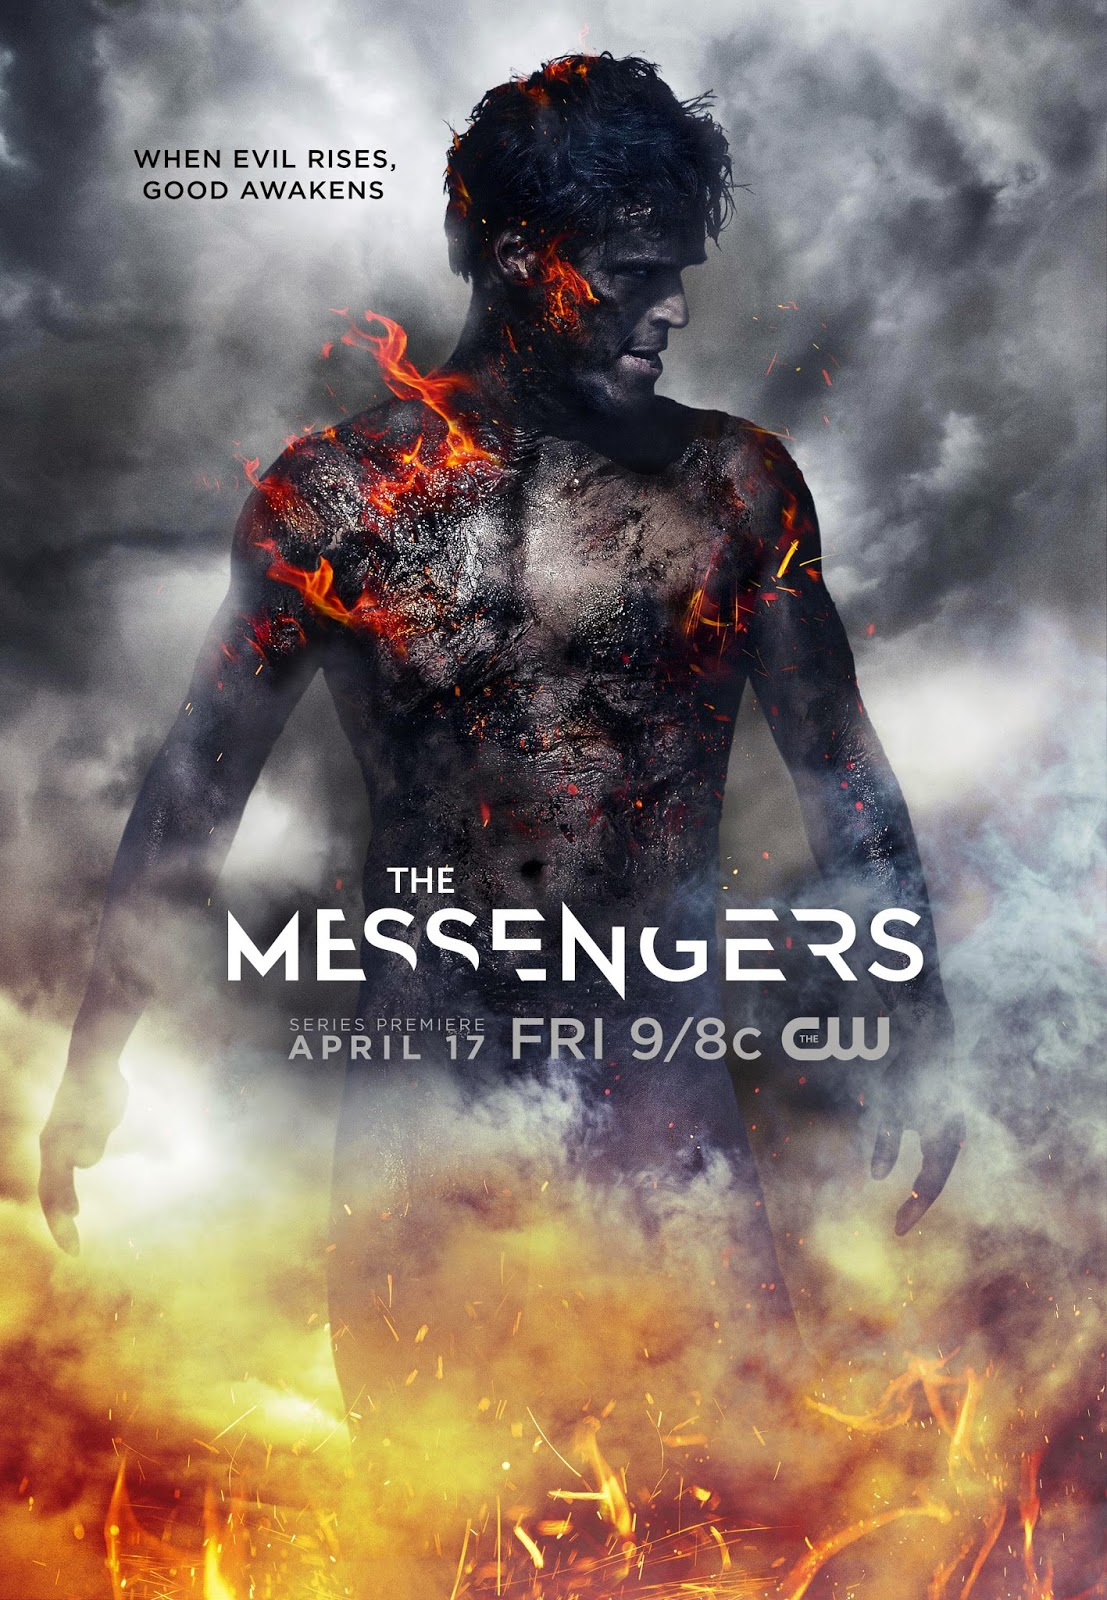 The Messenger (2015)